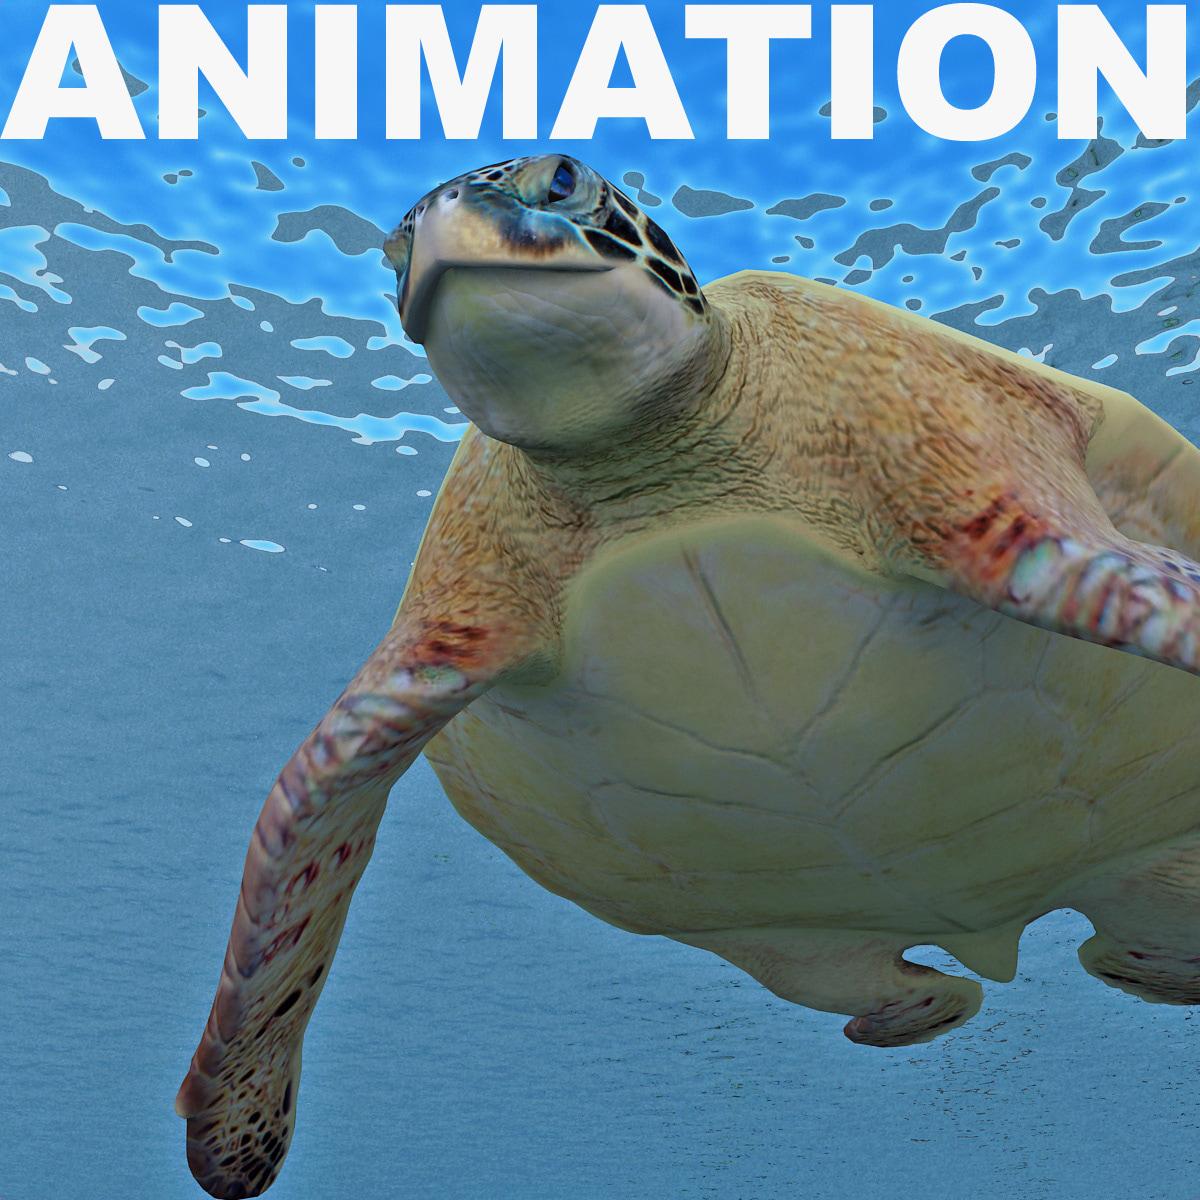 Turtle_Chelonia_Mydas_Animation_00.jpg